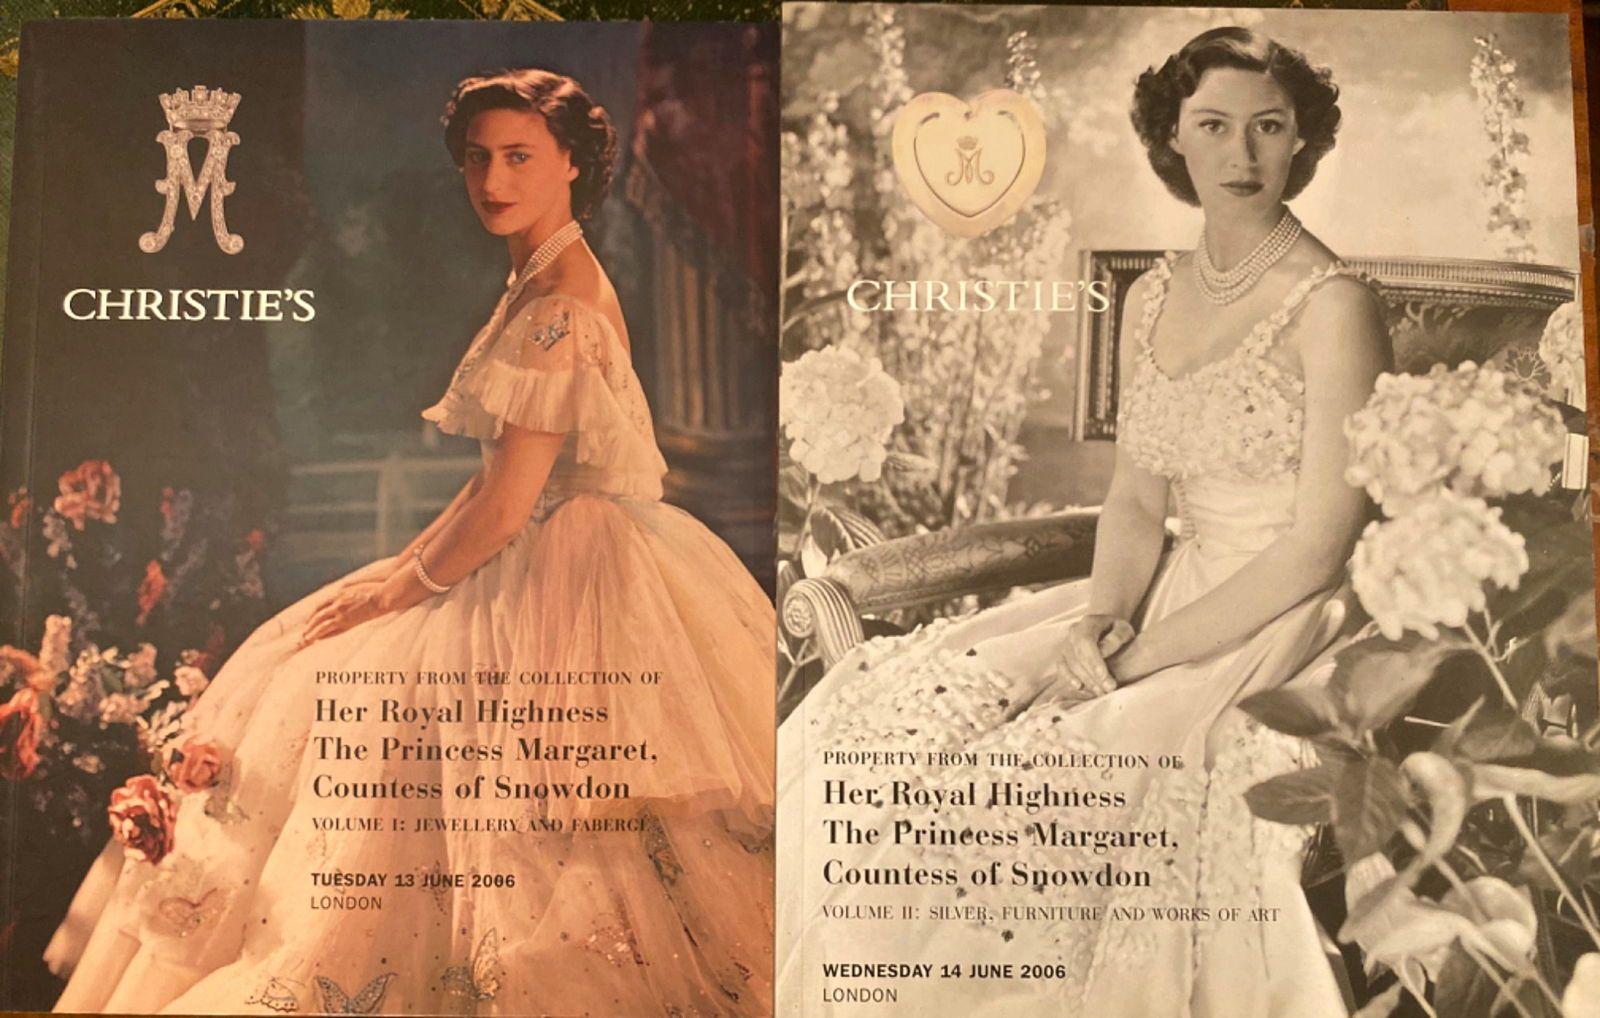 Royauté HRH Princesse Margaret Snowdon sœur de la Reine Elizabeth II